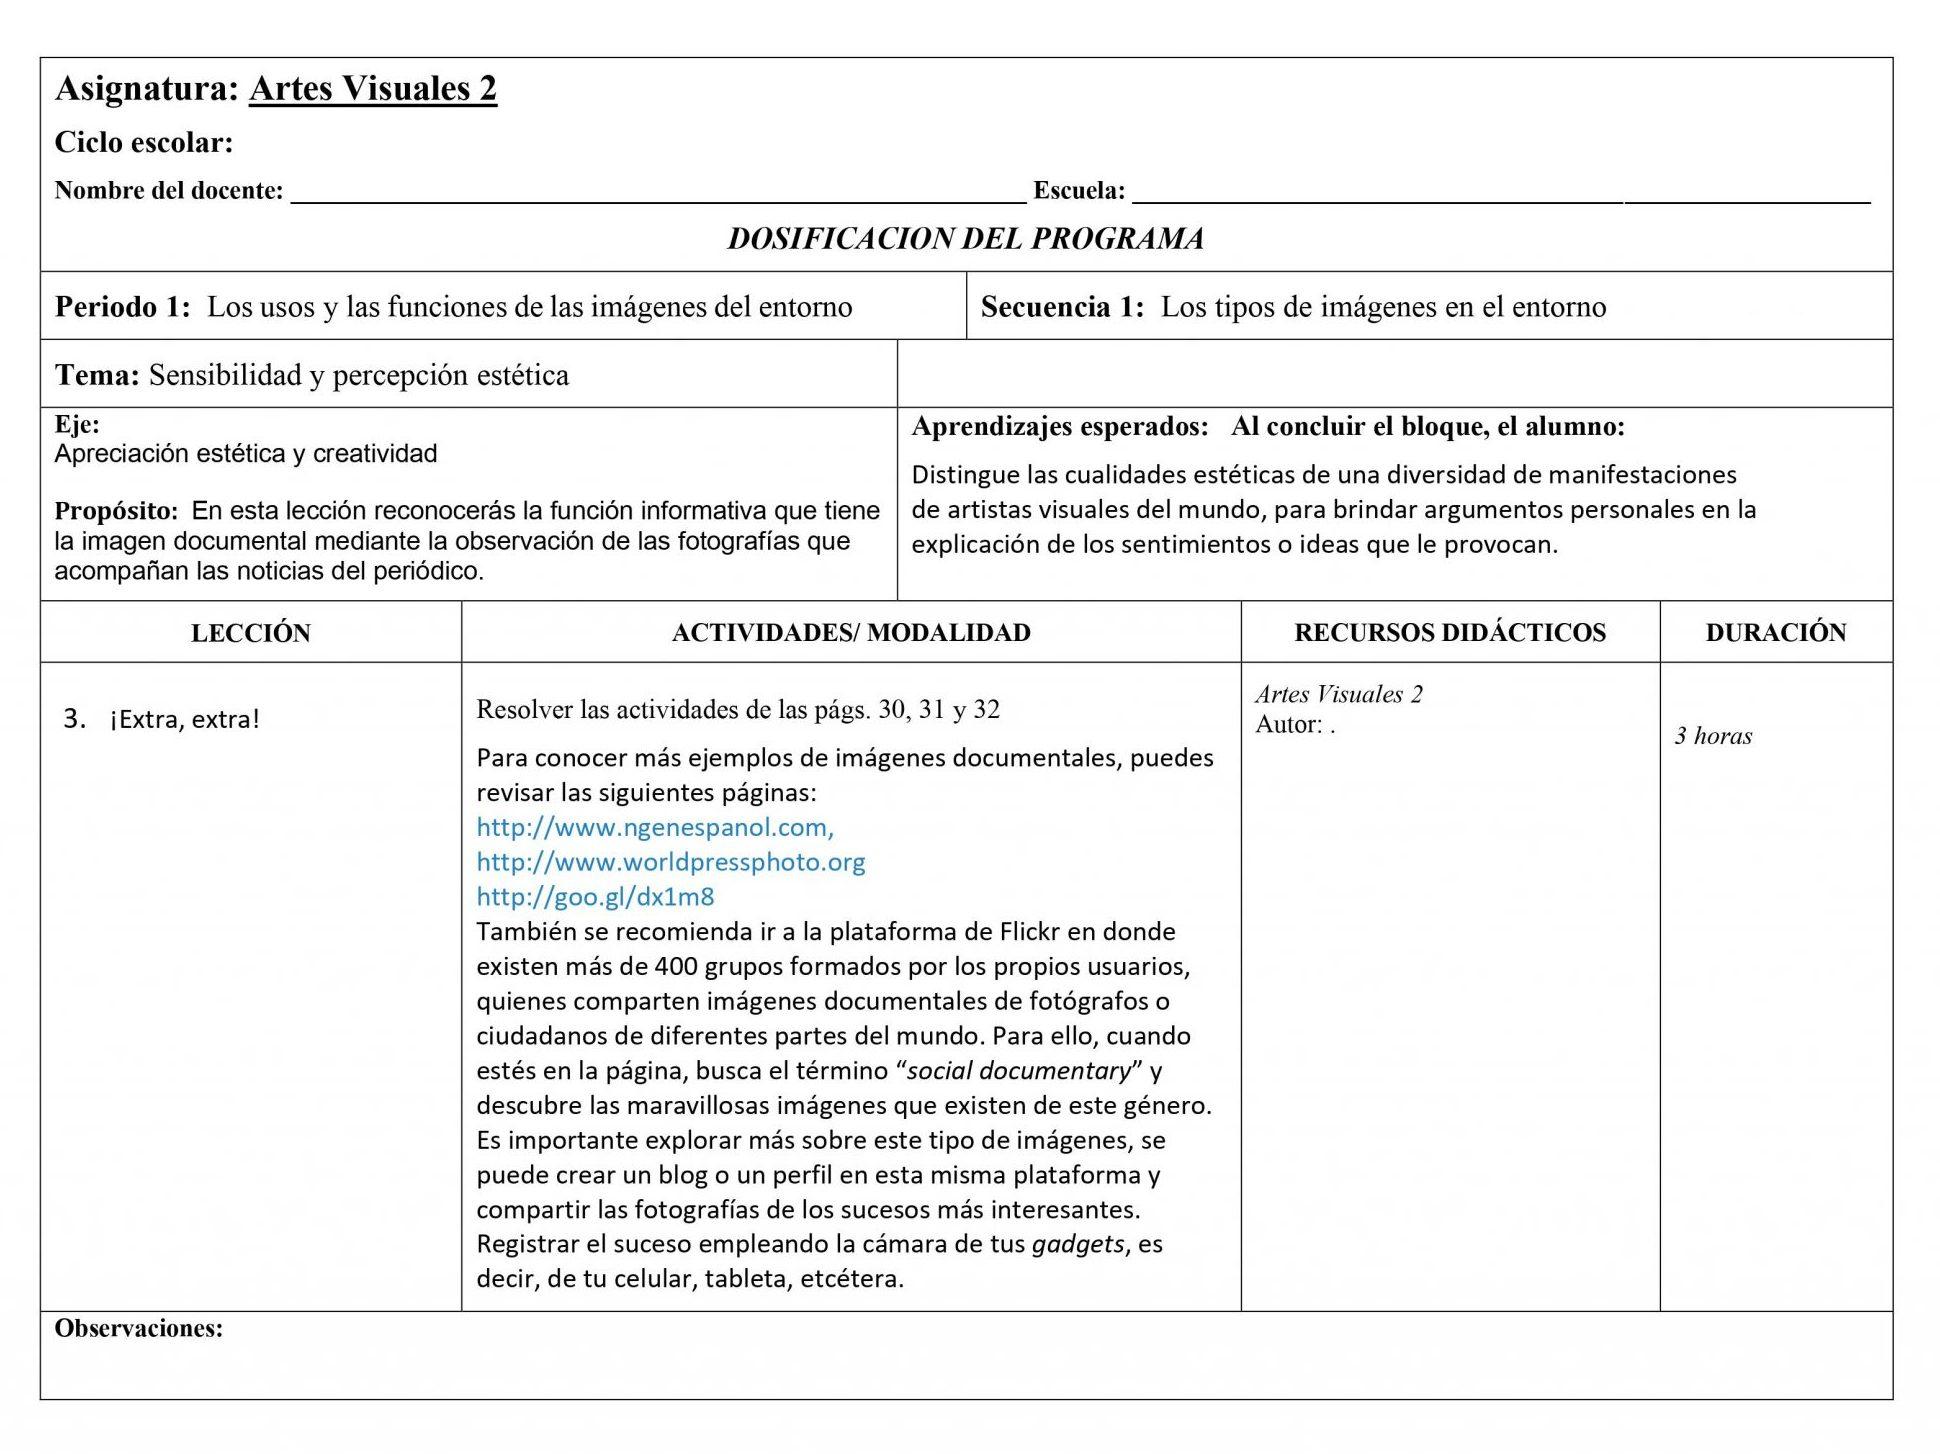 Dosificación Artes Visuales 2 Secundaria (Nuevo Modelo Educativo) 1er. Trimestre 03